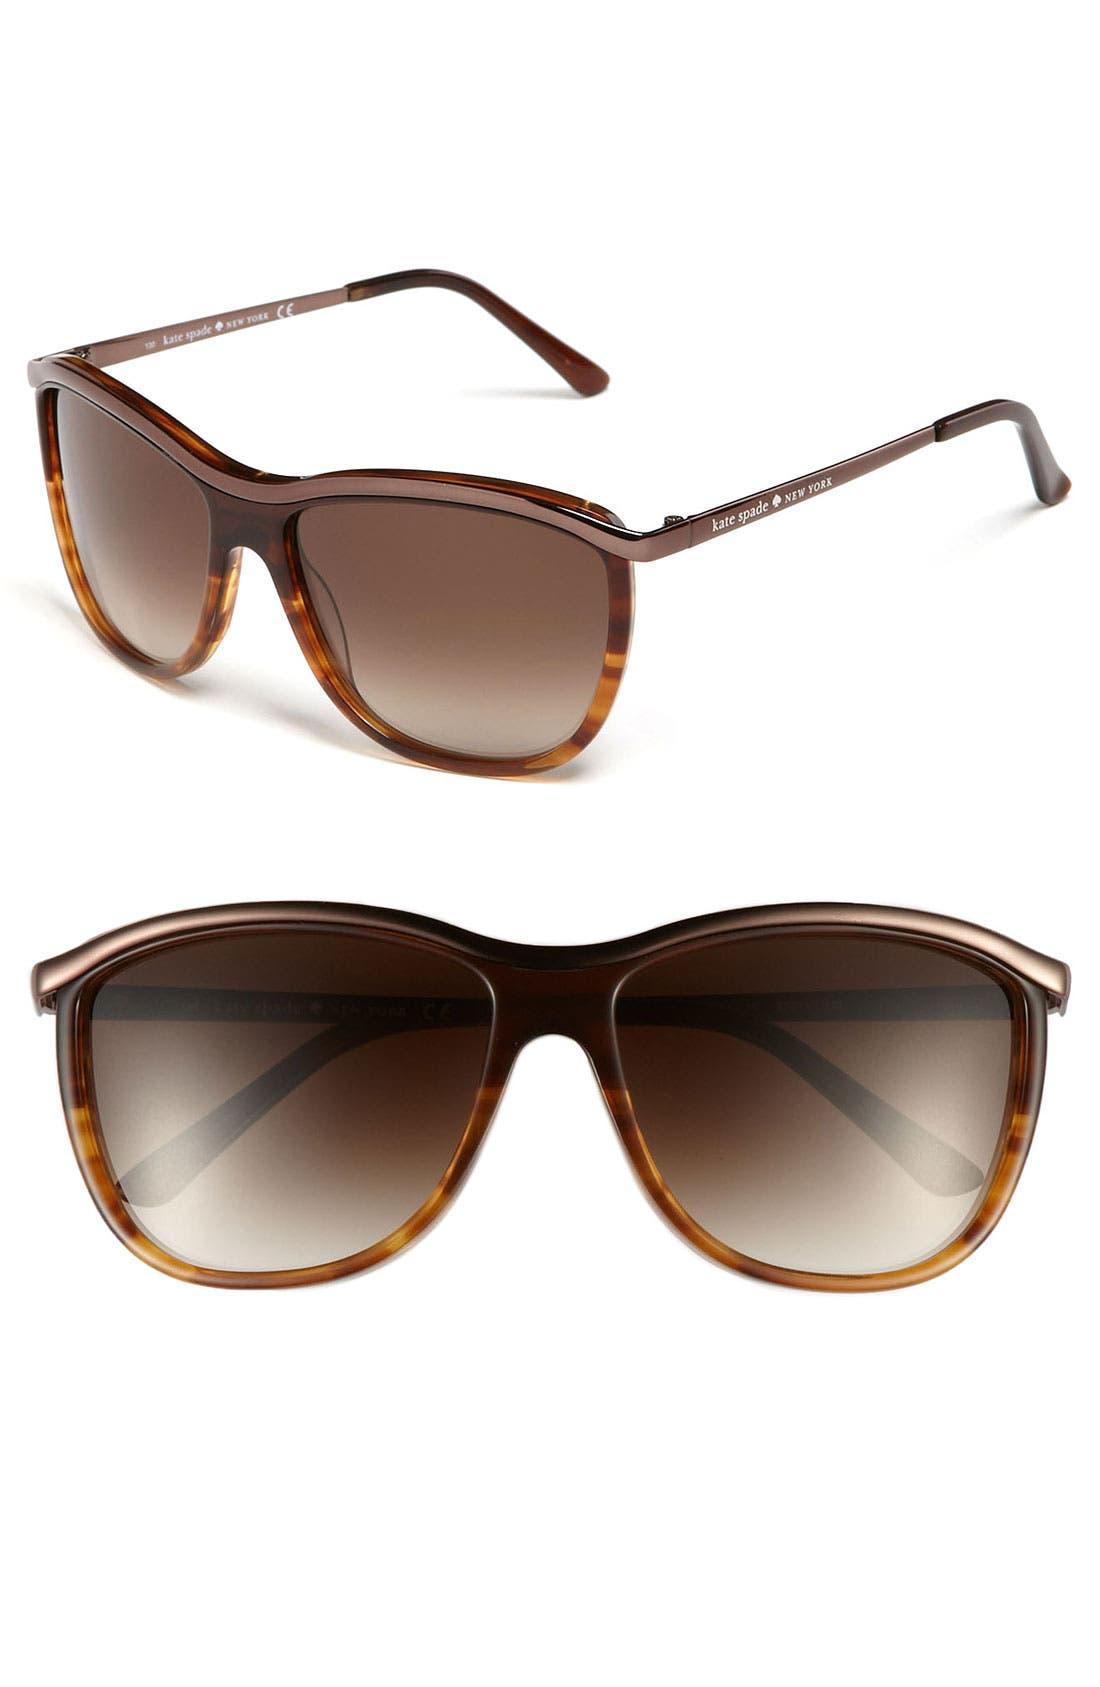 Alternate Image 1 Selected - kate spade new york 'domina' 57mm retro sunglasses